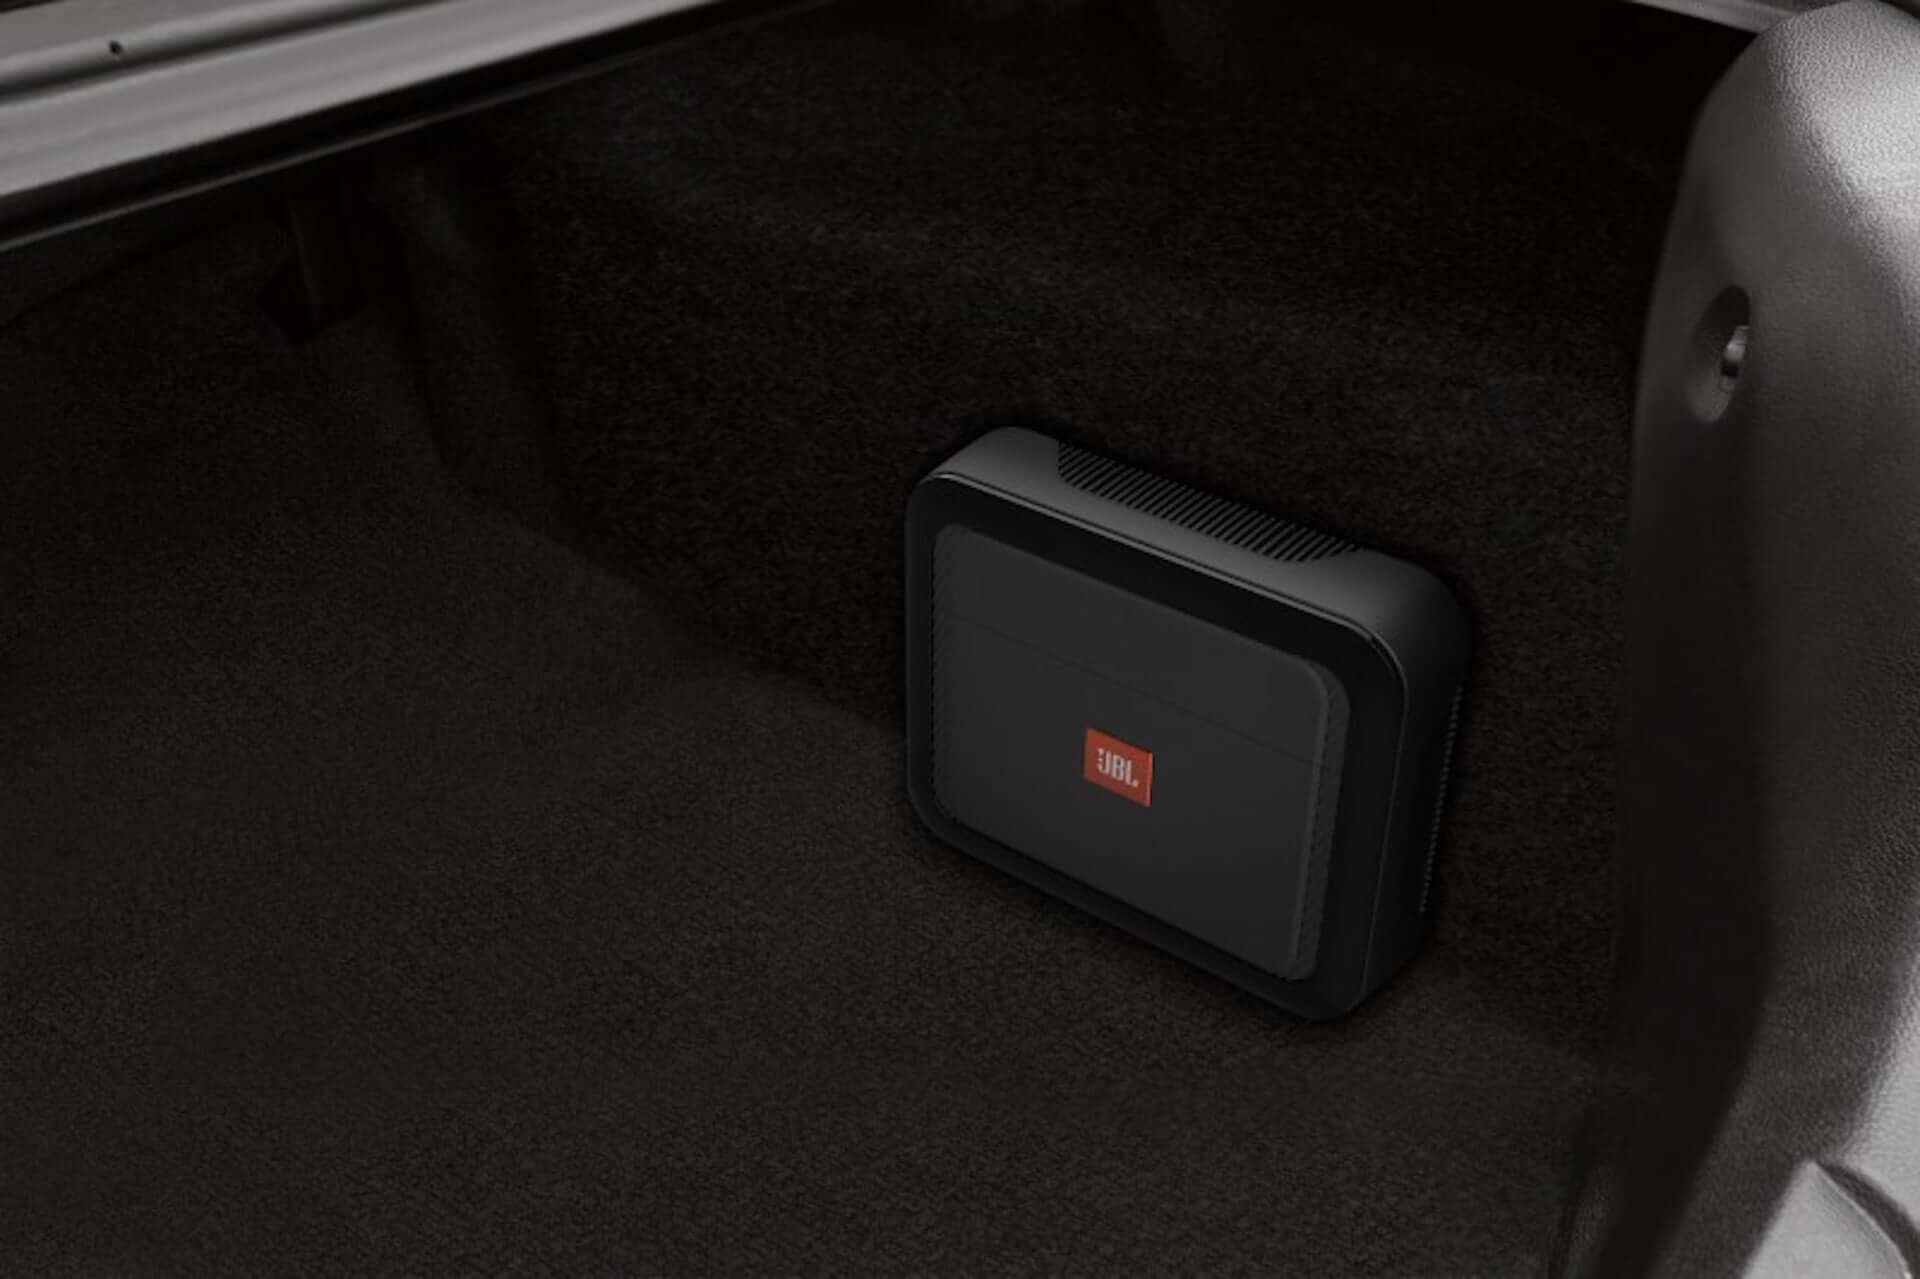 JBLのモバイルアンプでカーオーディオを手軽にアップグレード!「CLUB」シリーズから新モデルが発売決定 tech200327_jbl_club_3-1920x1279